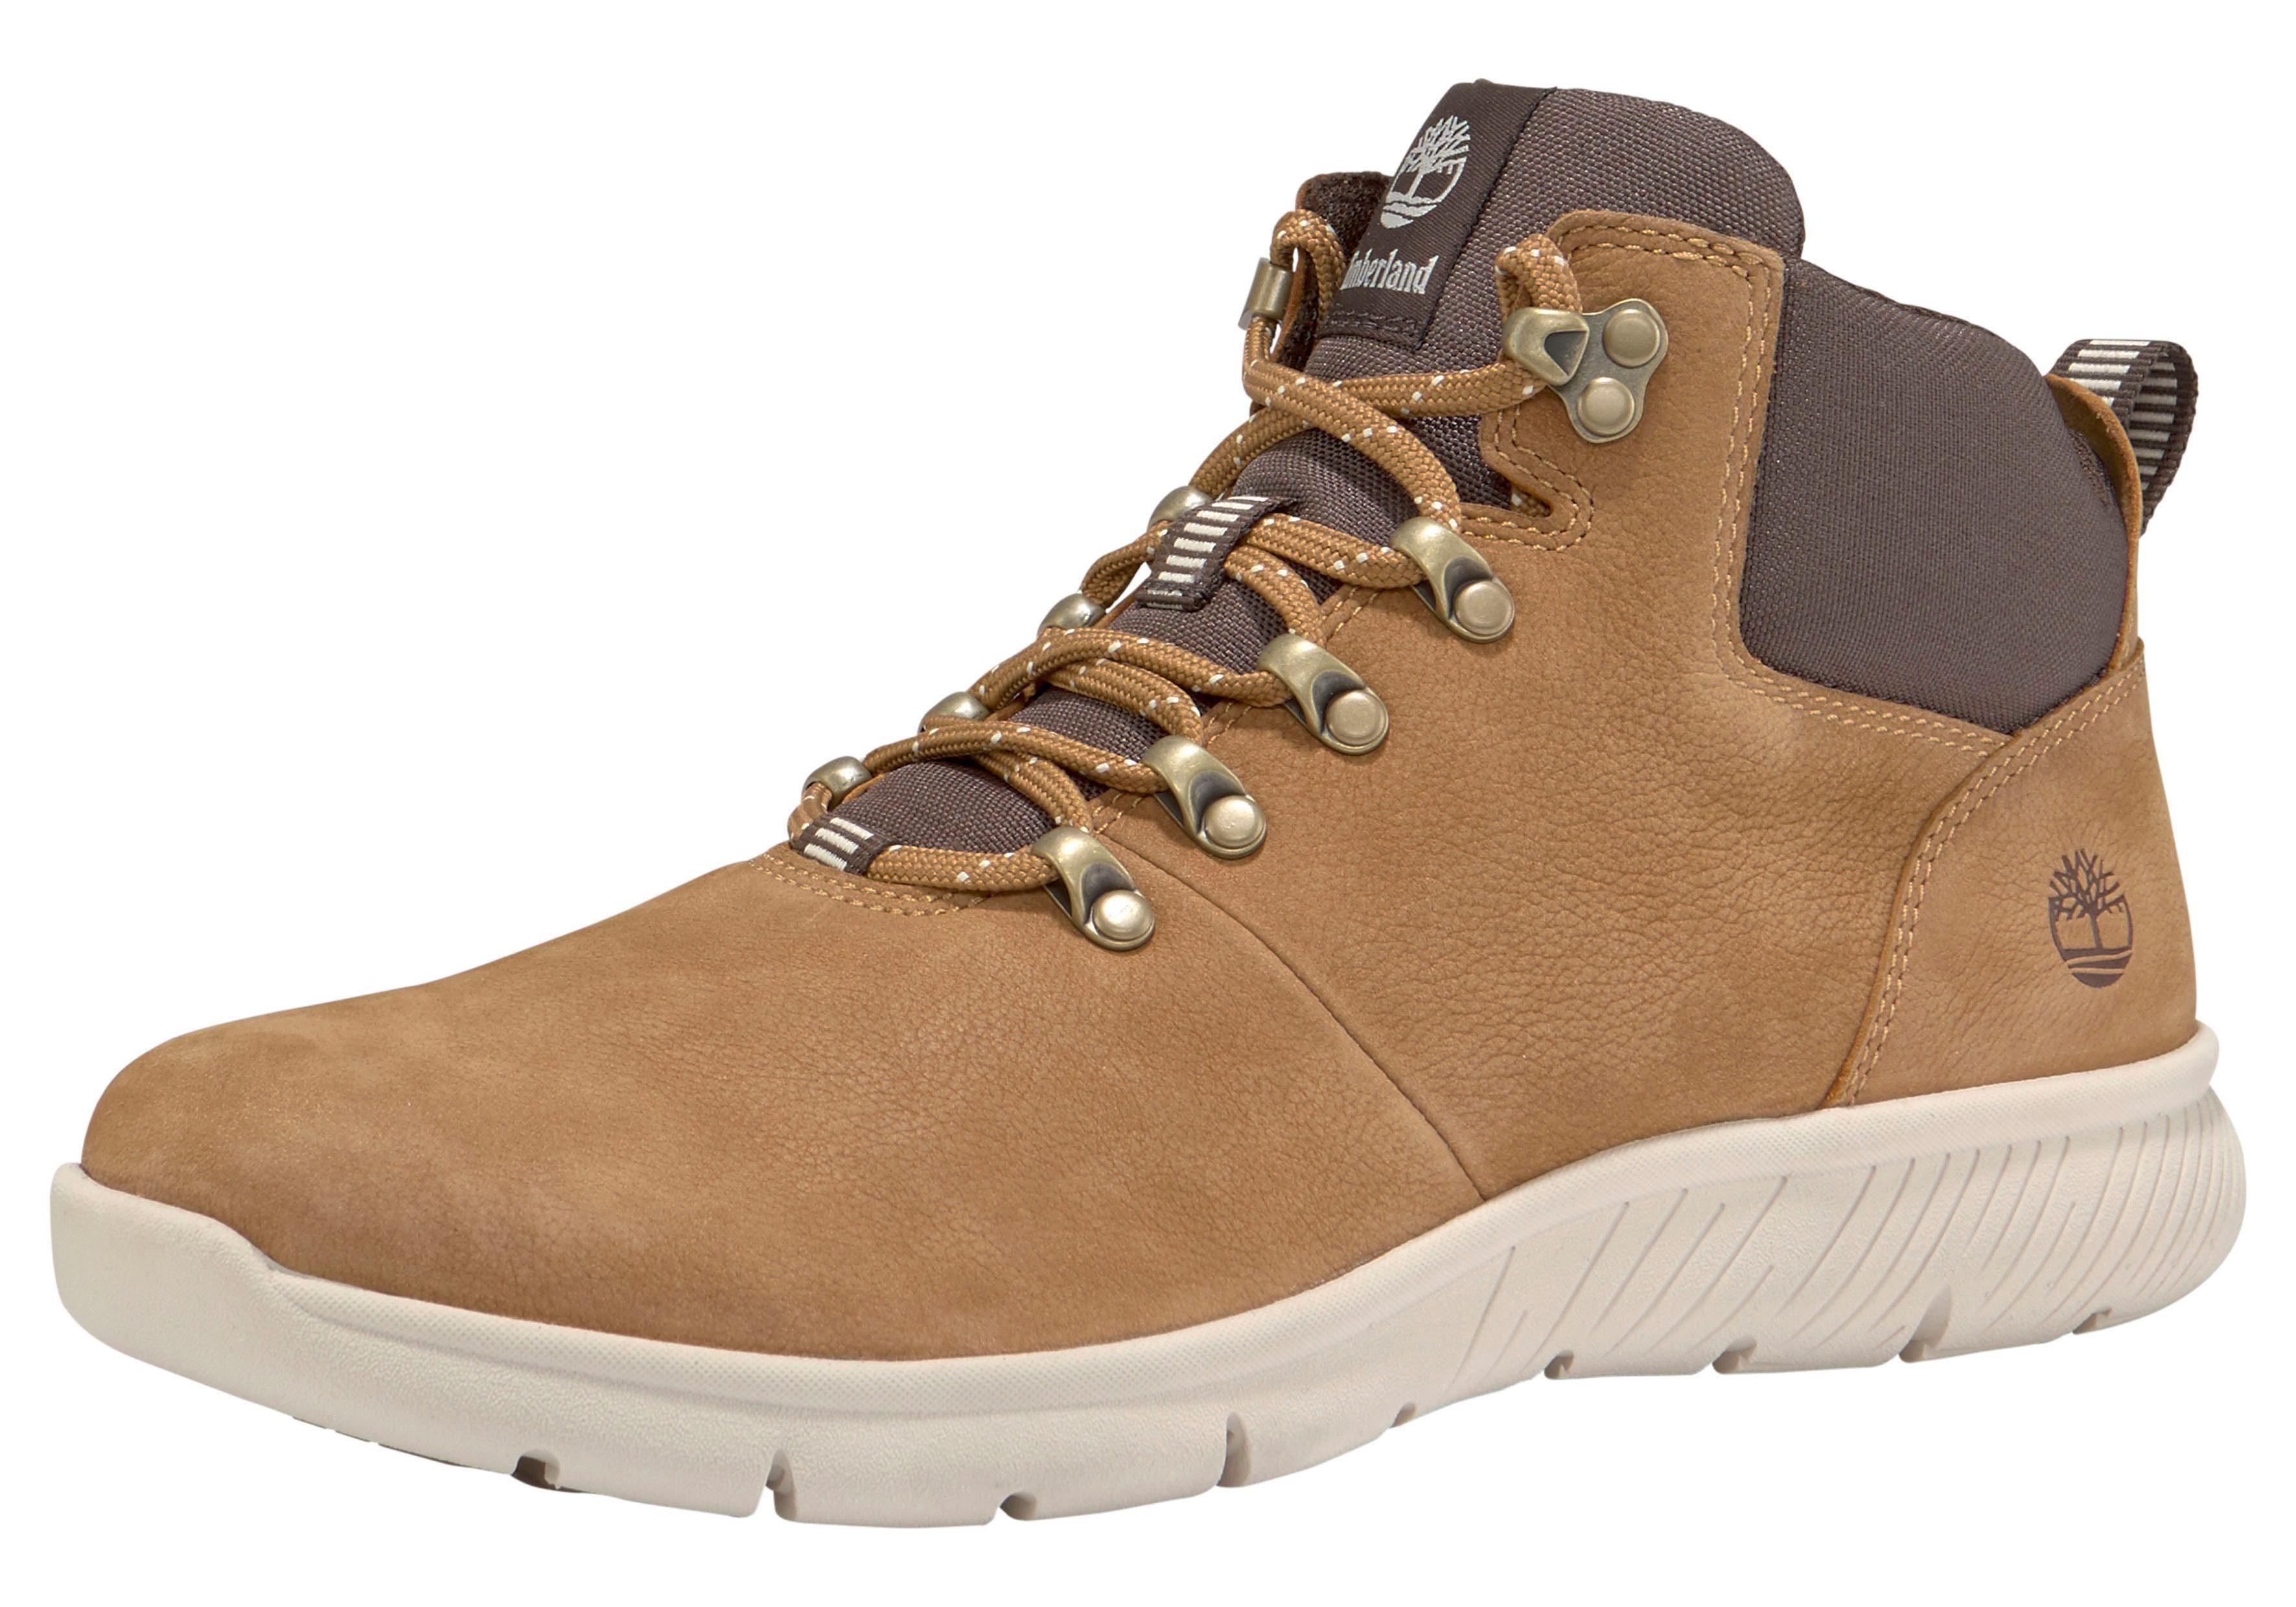 Timberland »Boltero Leather Hiker« Sneaker kaufen | OTTO